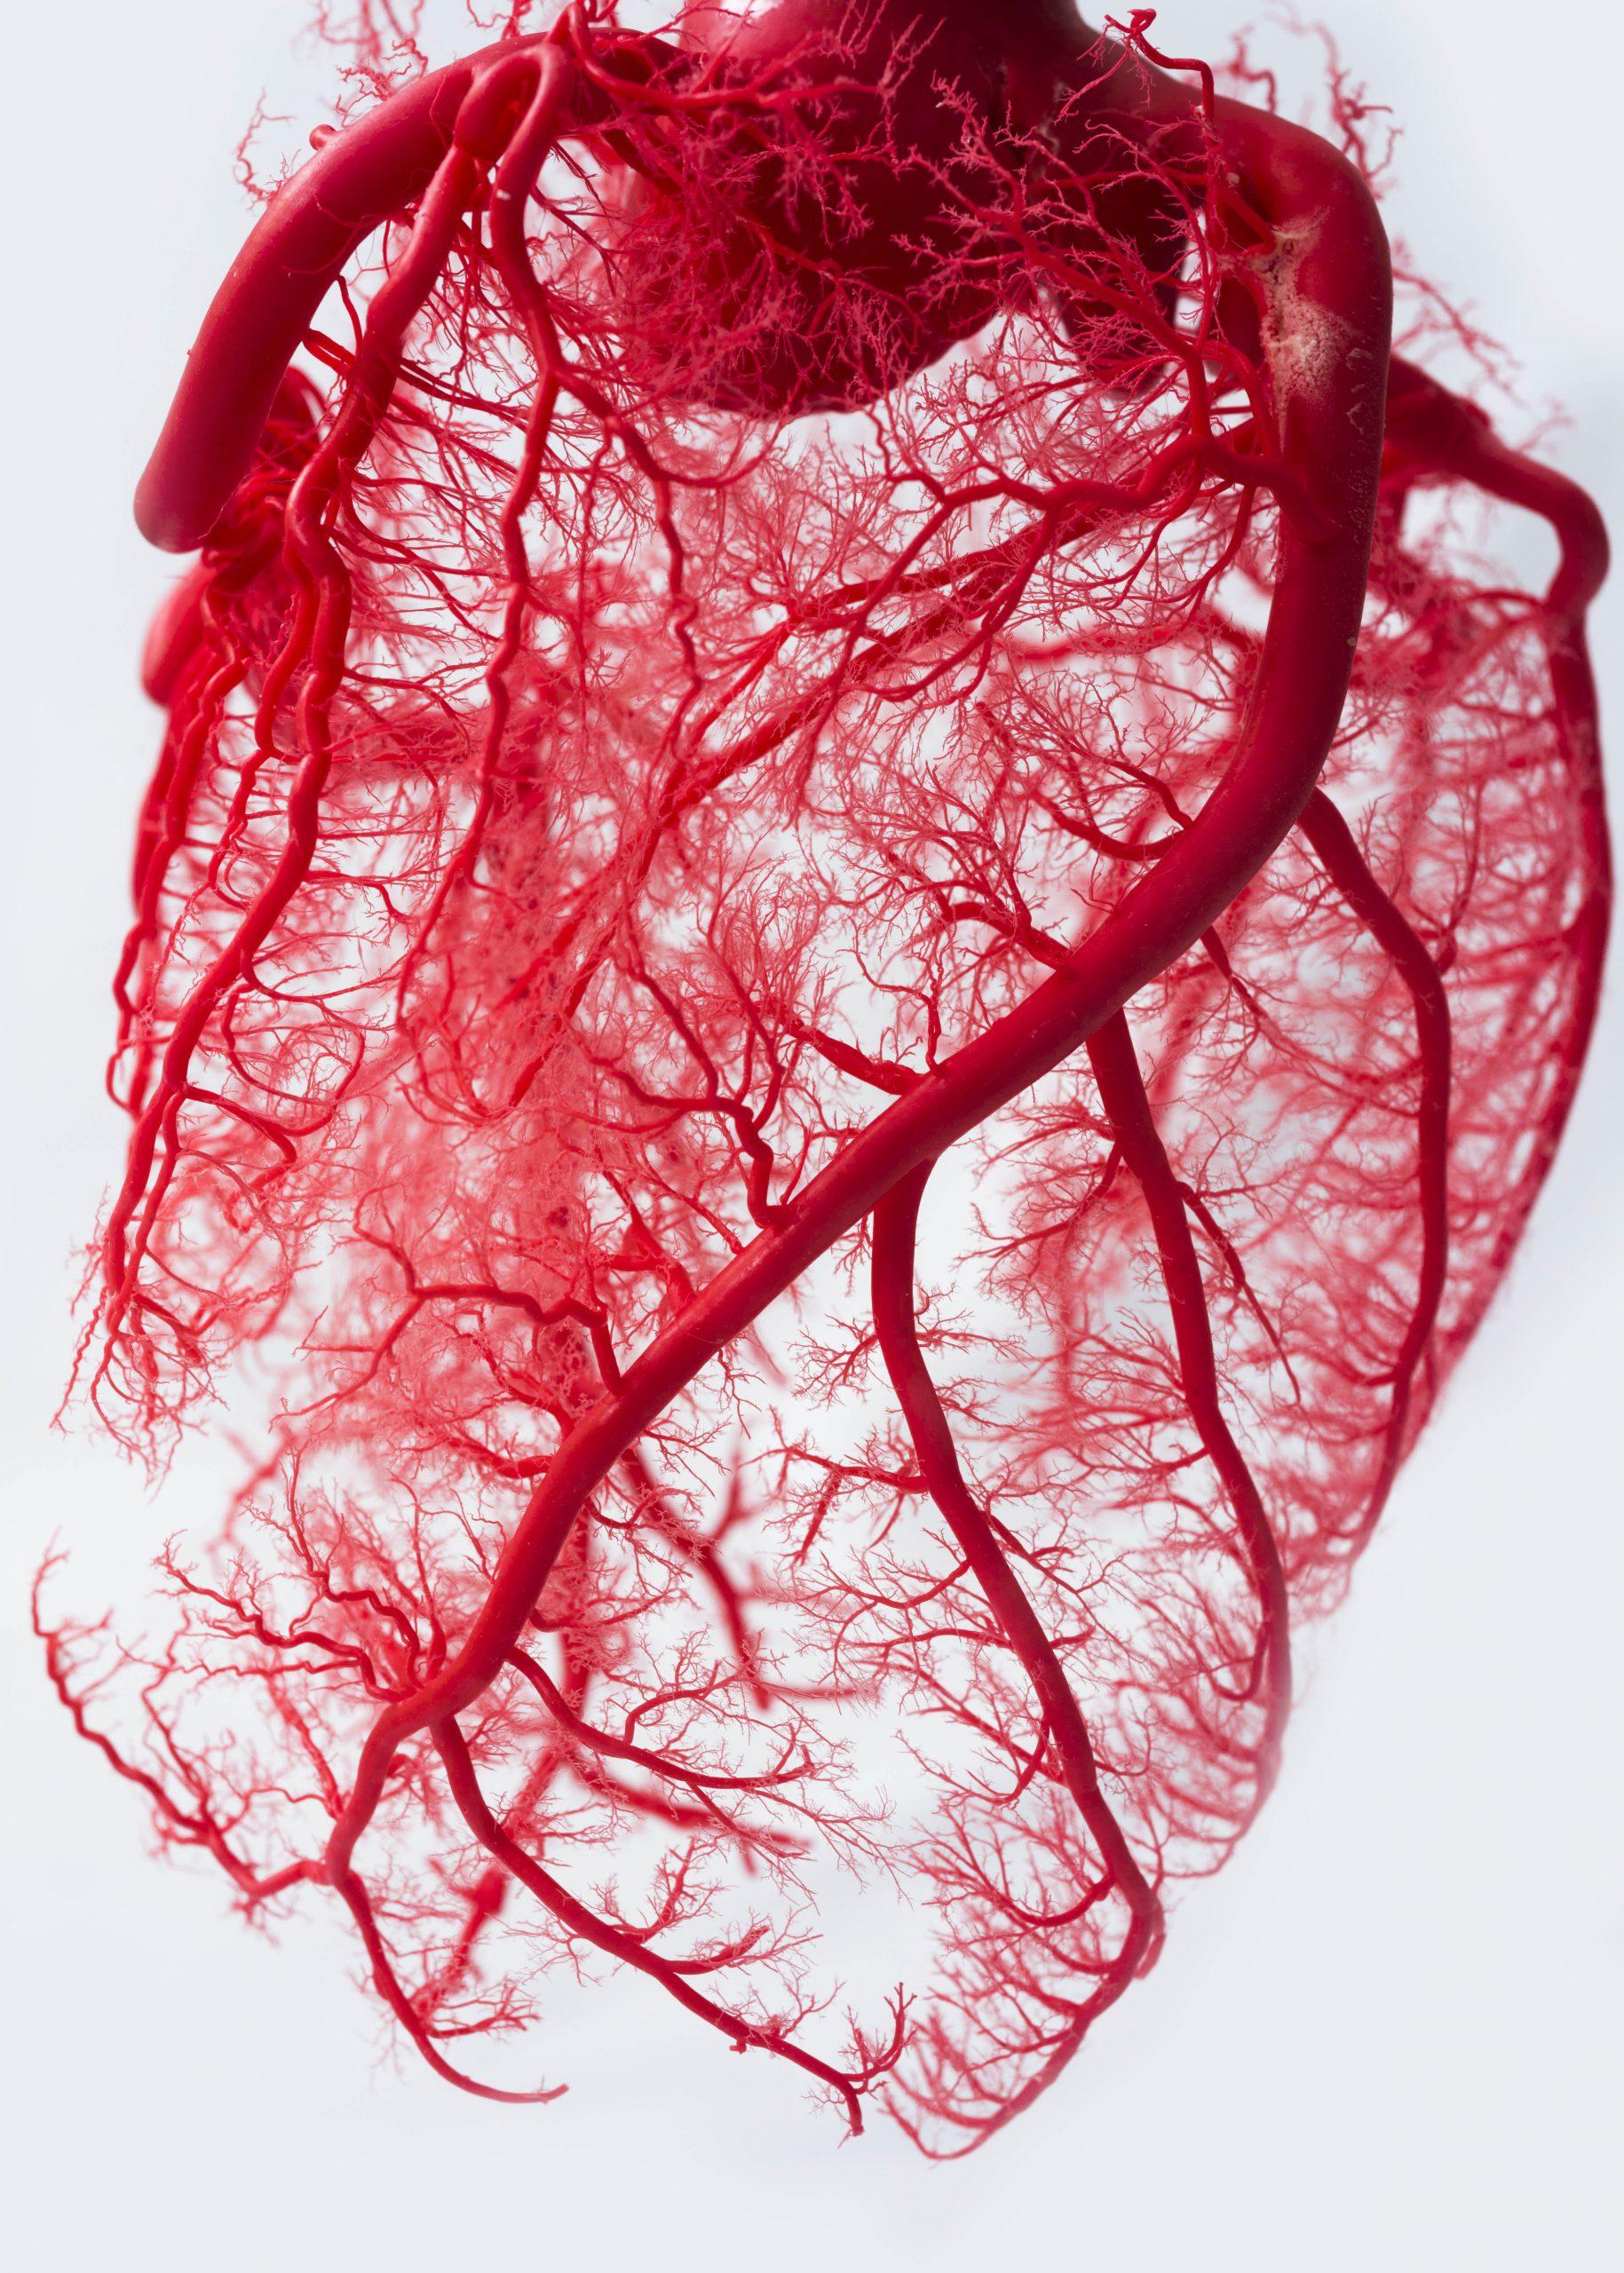 Fractal Human Heart Vascular System